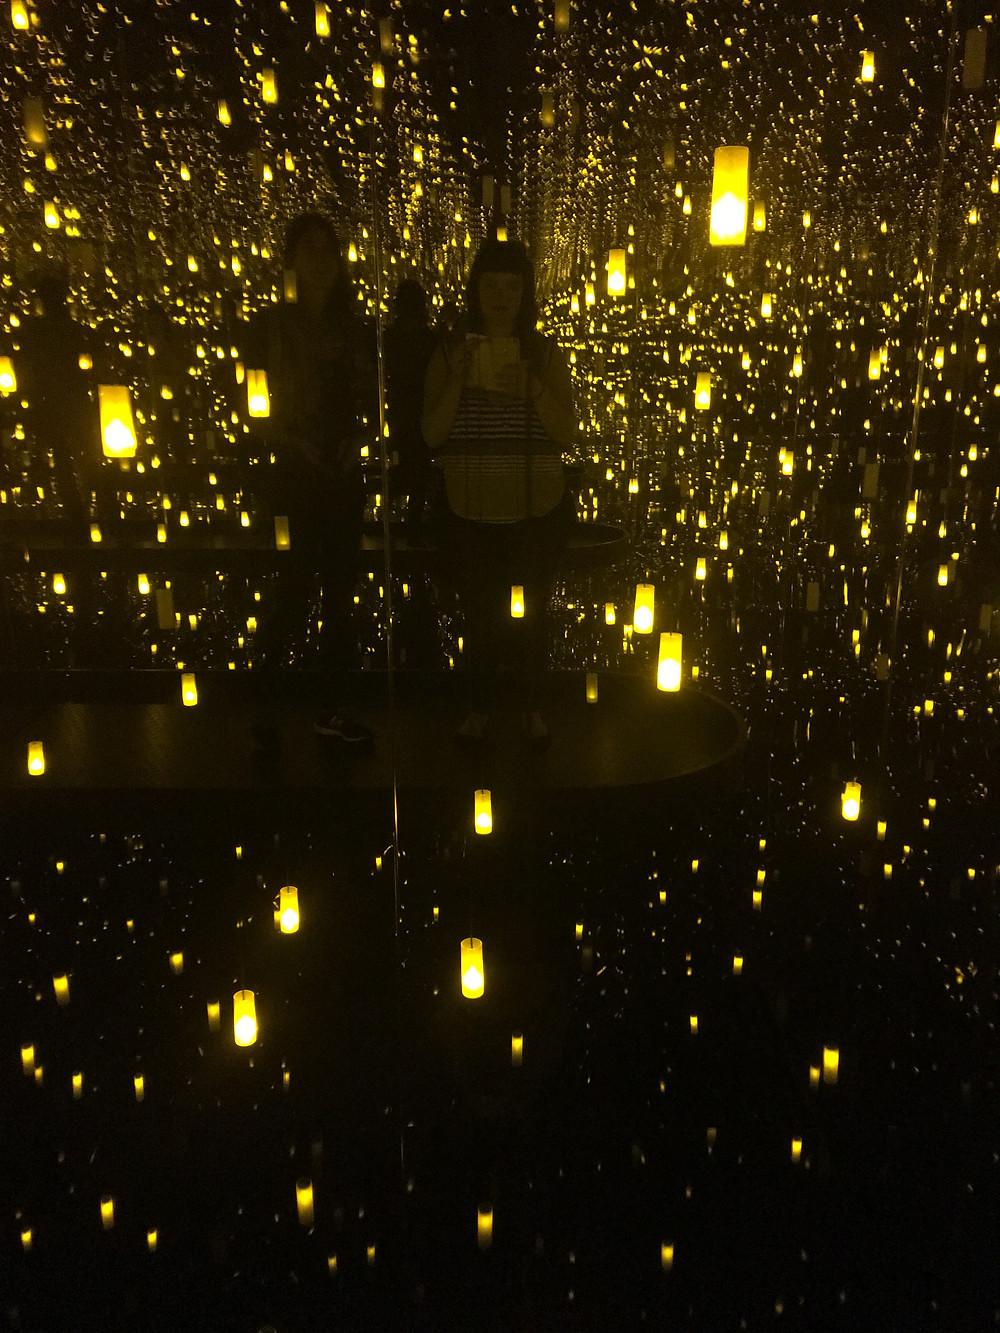 Kusama Infinity Room